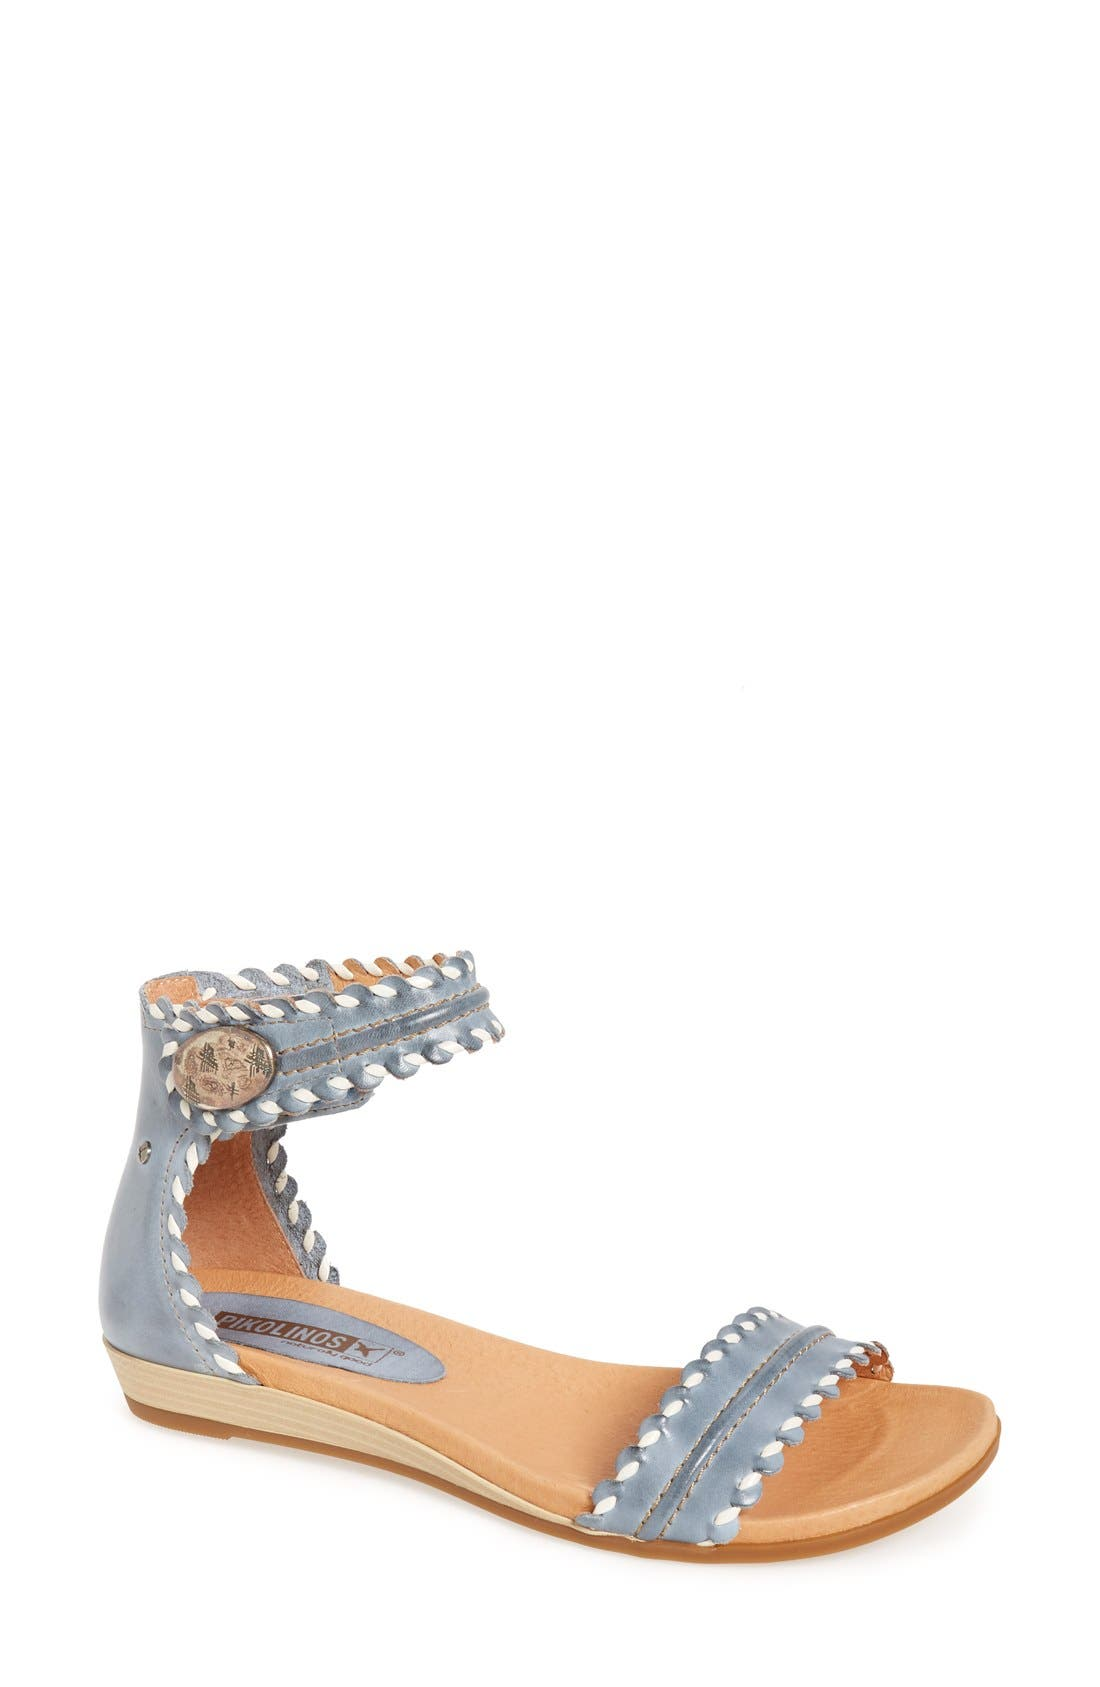 'Alcudia' Ankle Strap Sandal,                             Main thumbnail 1, color,                             Denim Leather